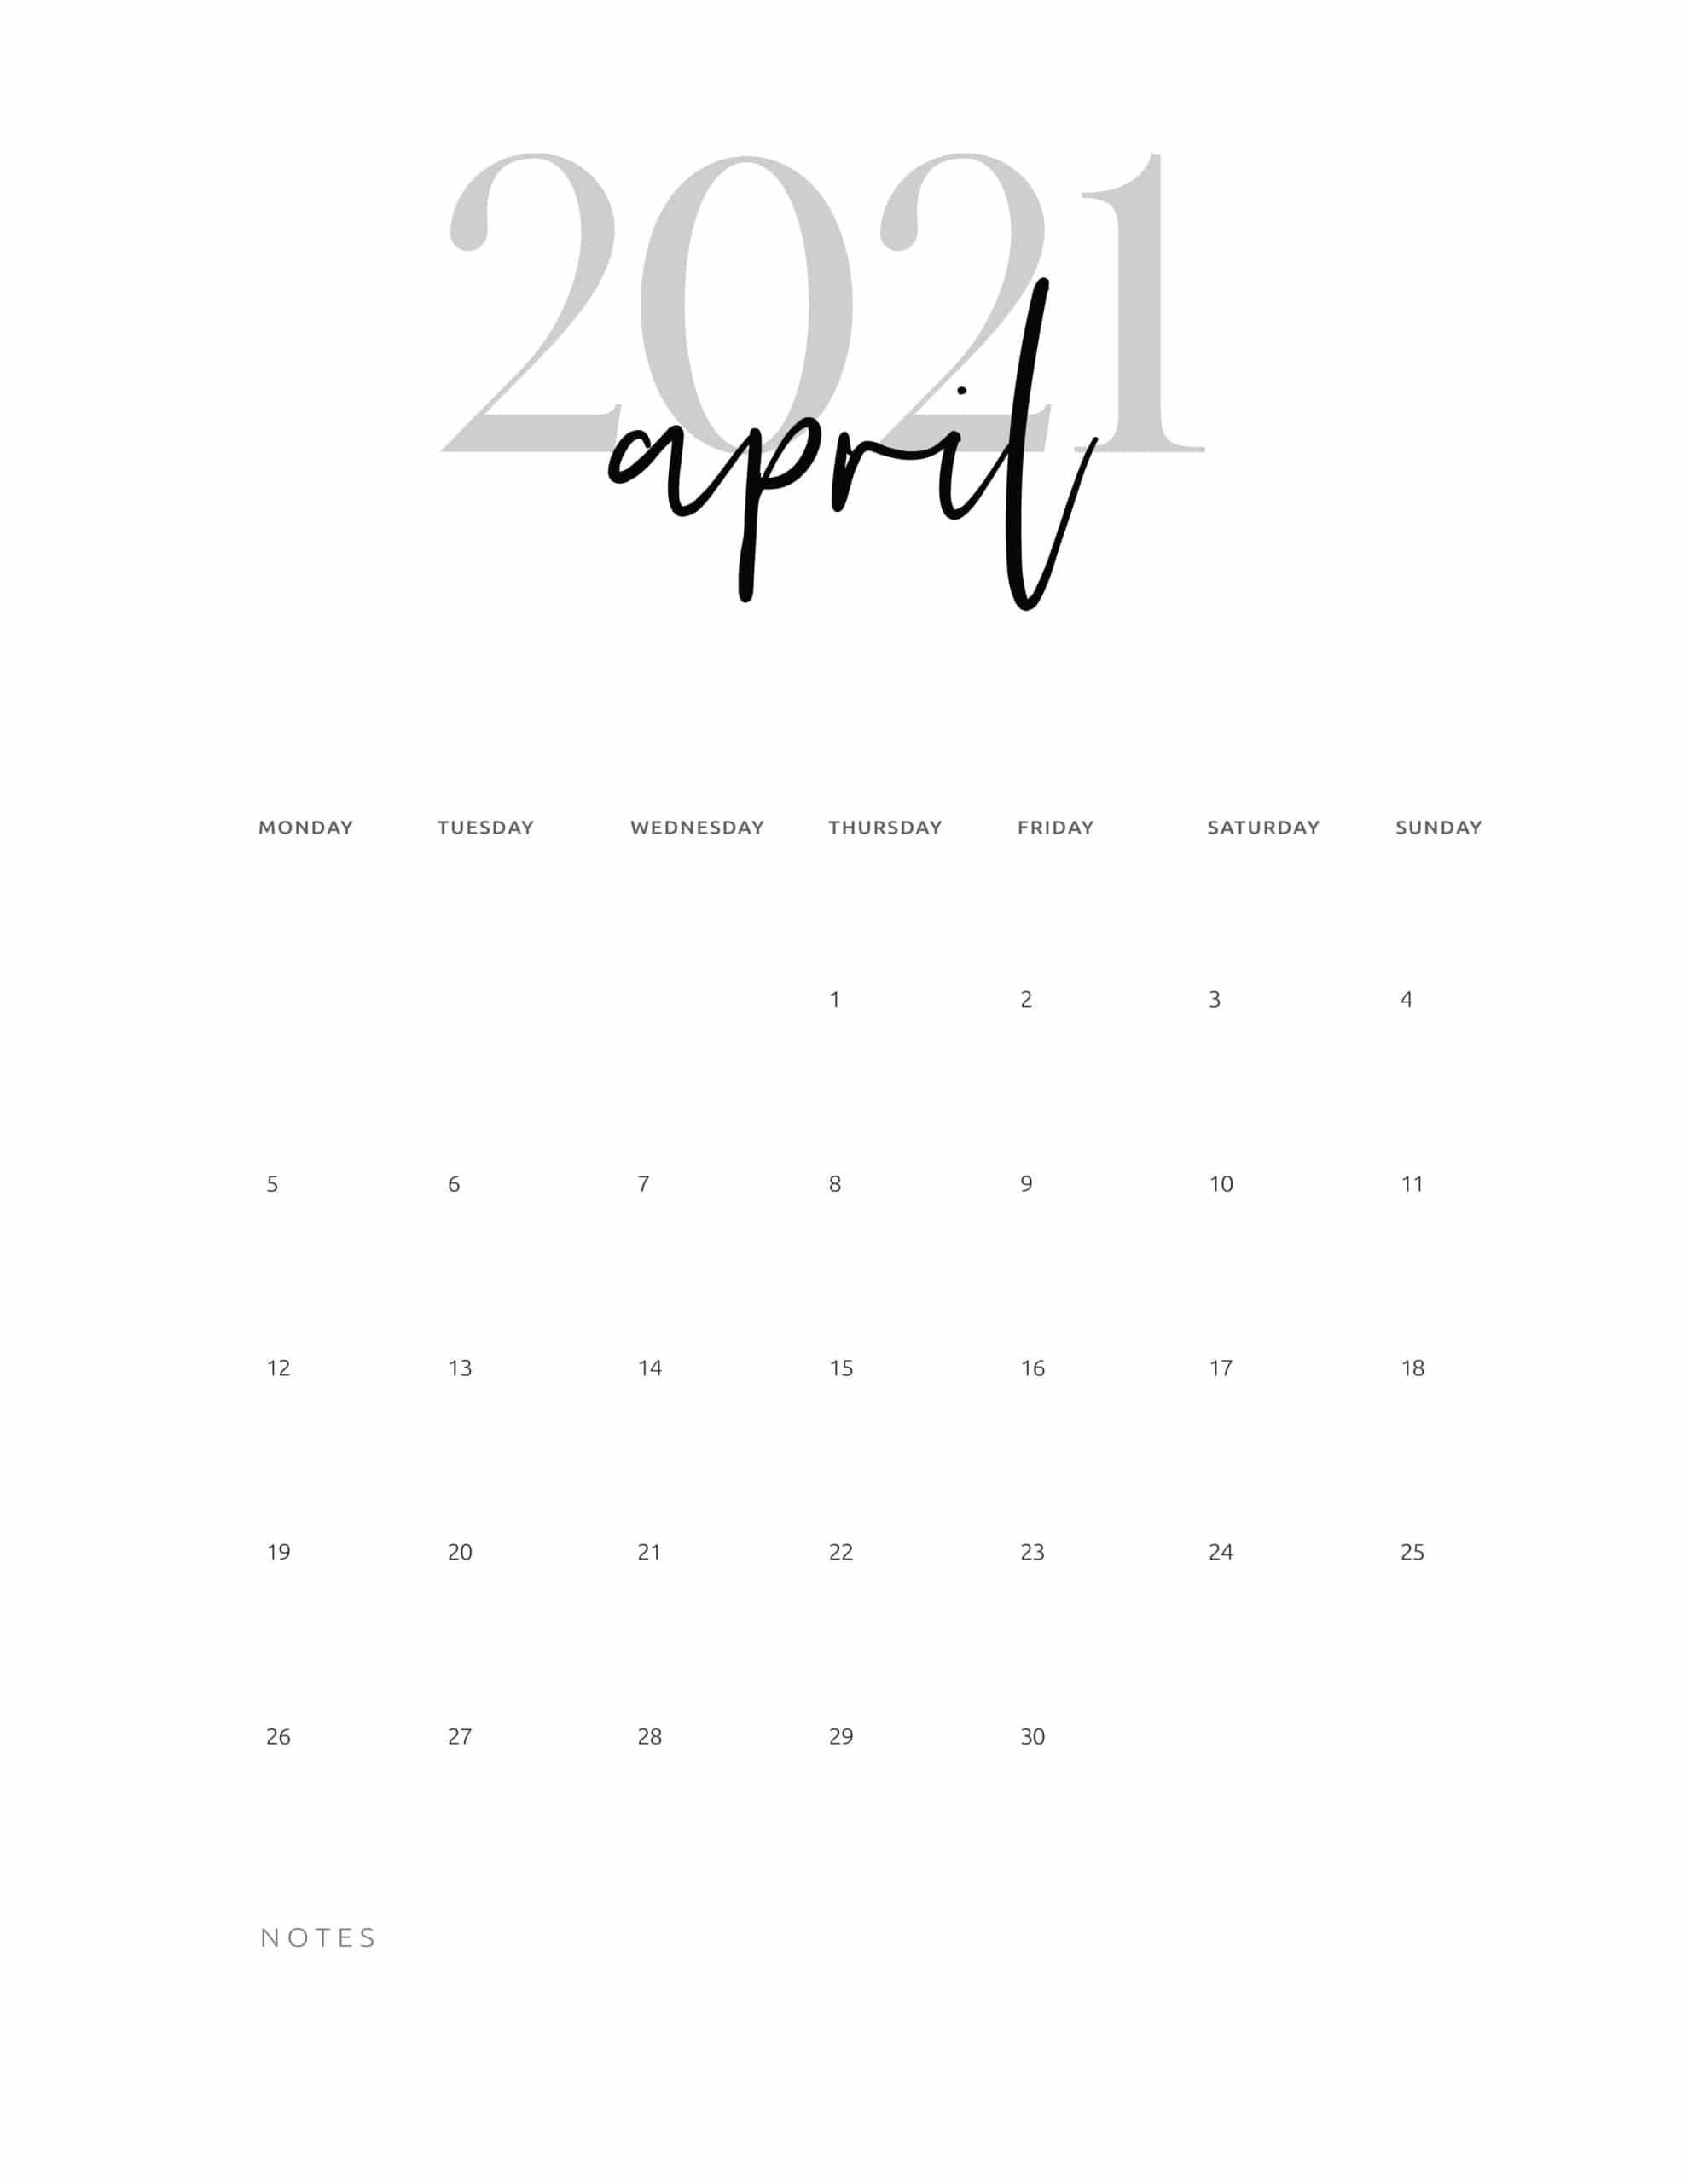 2021 Calendar Printable Cursive - World of Printables